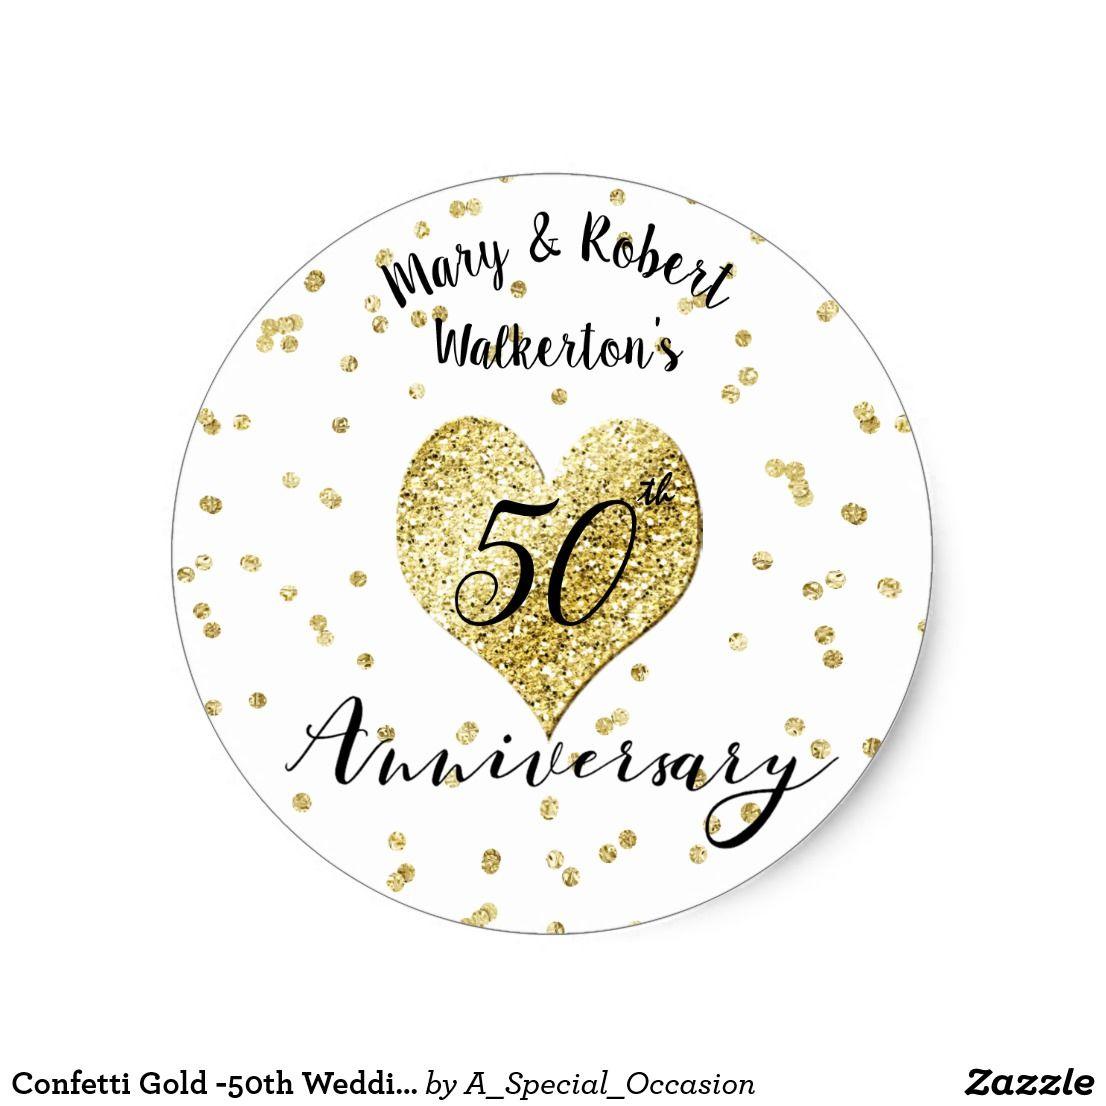 Confetti Gold 50th Wedding Anniversary Sticker Zazzle Com 50th Wedding Anniversary Wedding Stickers 50th Wedding